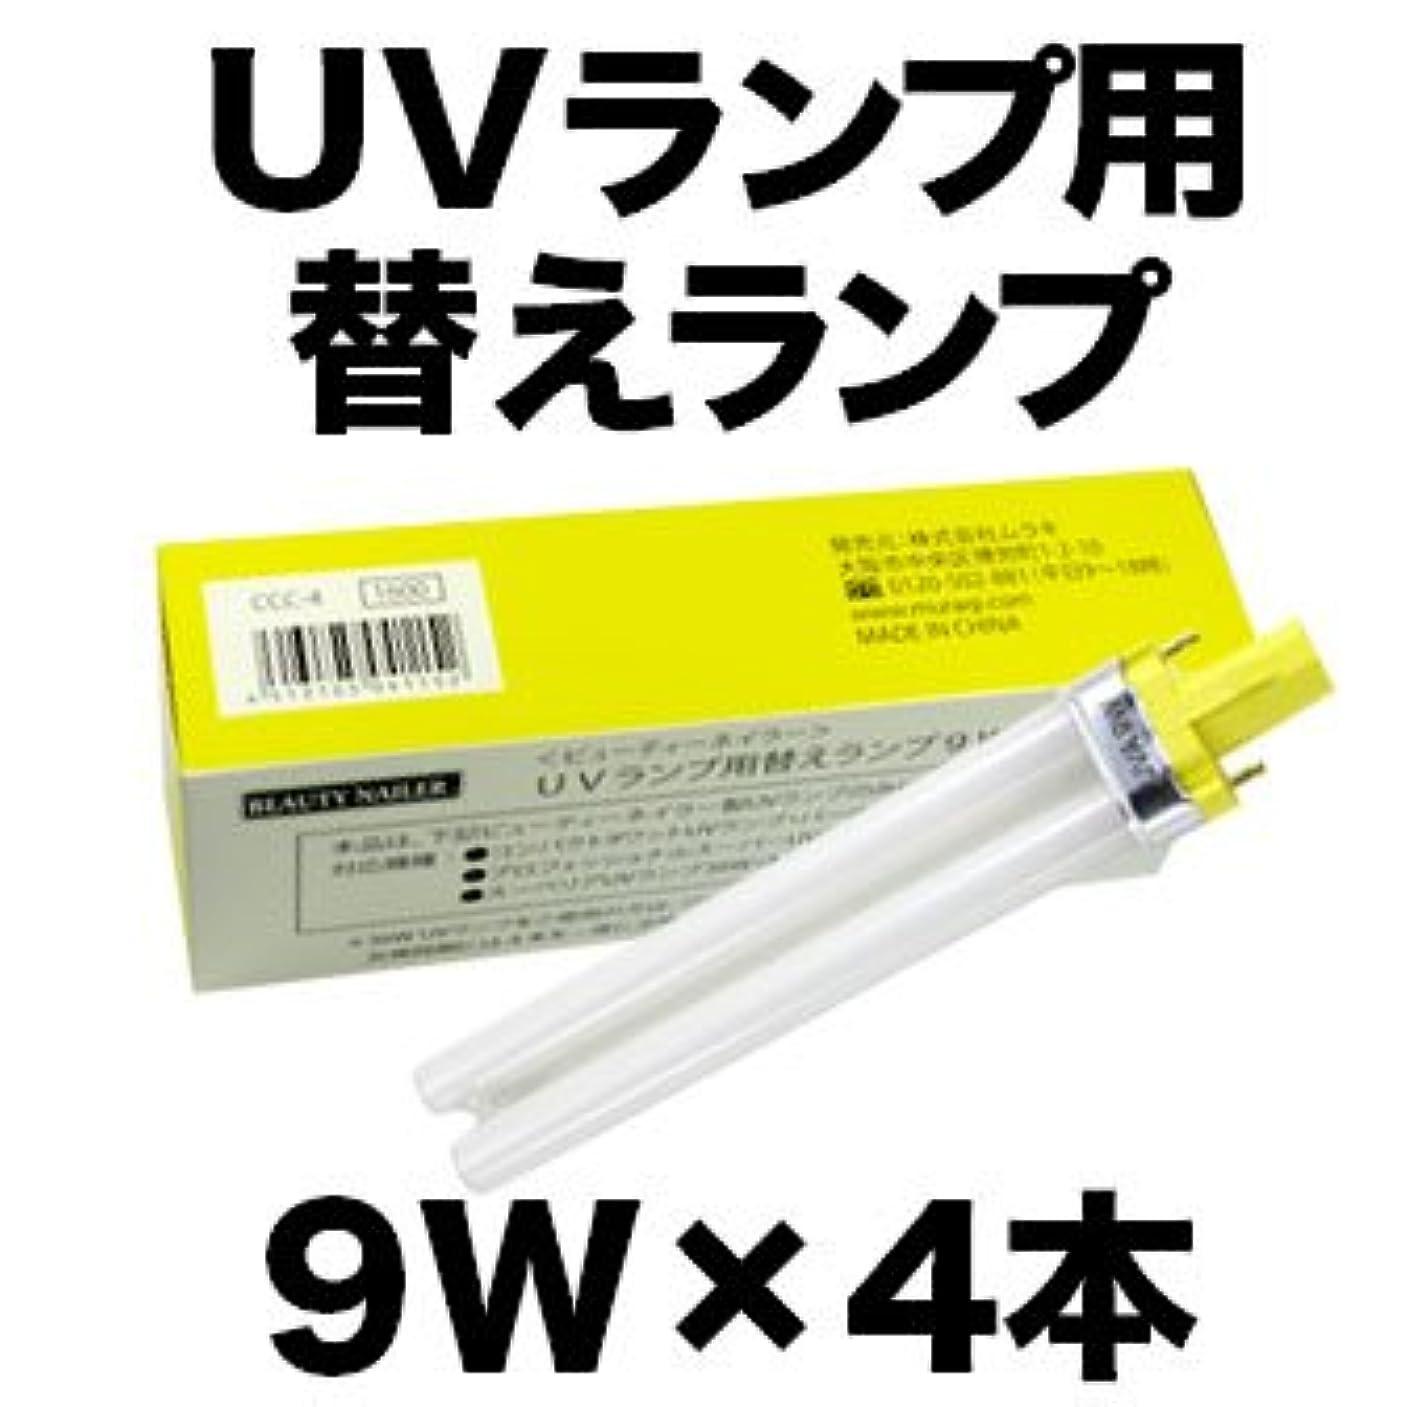 BEAUTY NAILER UVライト ジェルネイル 替えライト 36W用 4本